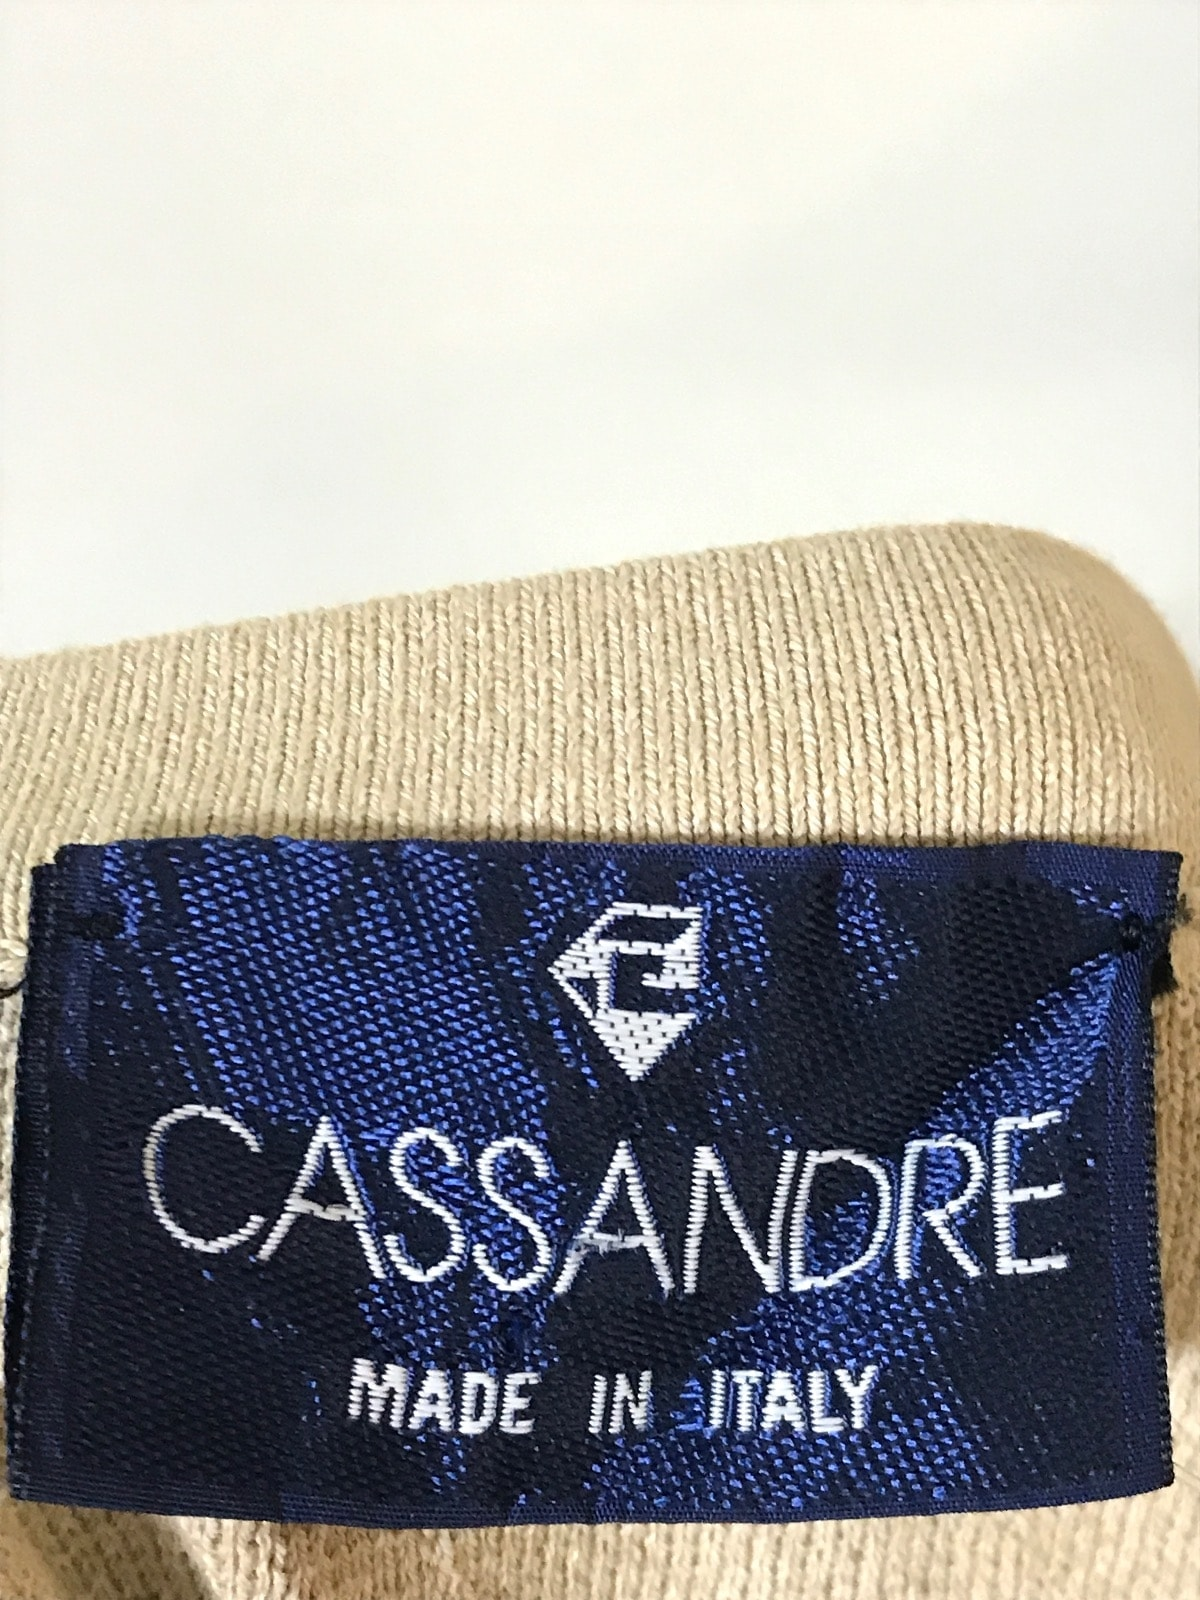 cassandre(カサンドレ)のスカート